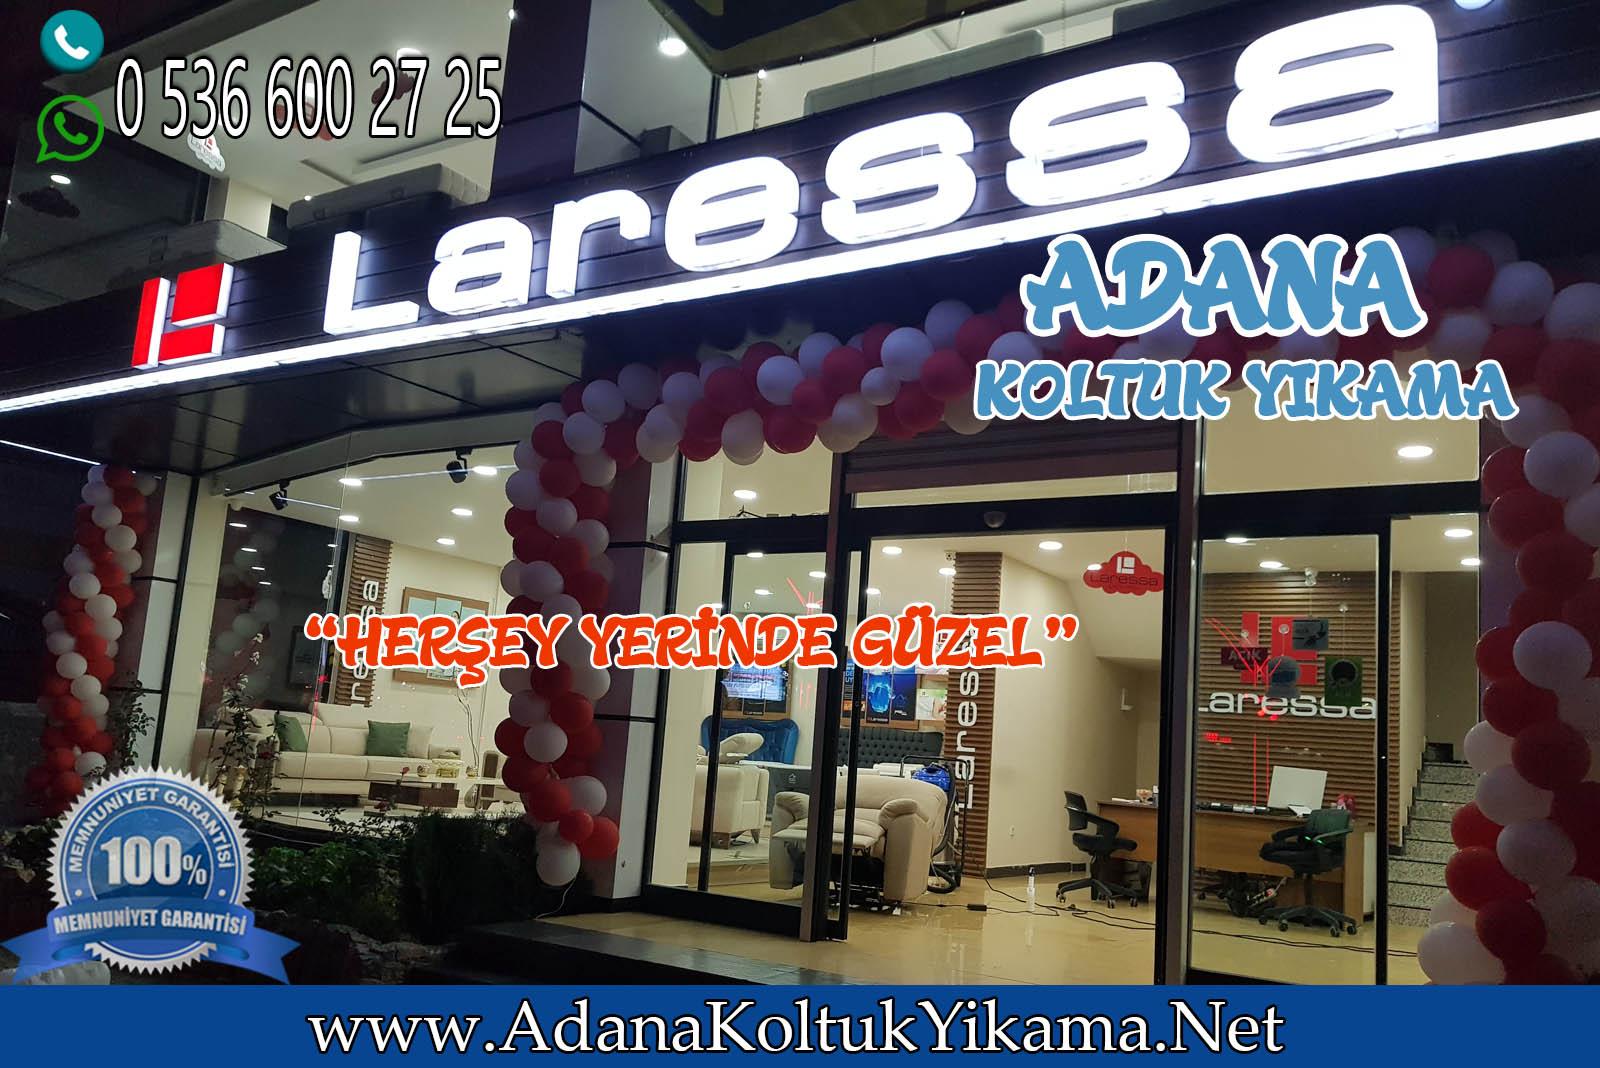 Adana Koltuk Yıkama + Laressa Yatak Yıkama Çukurova